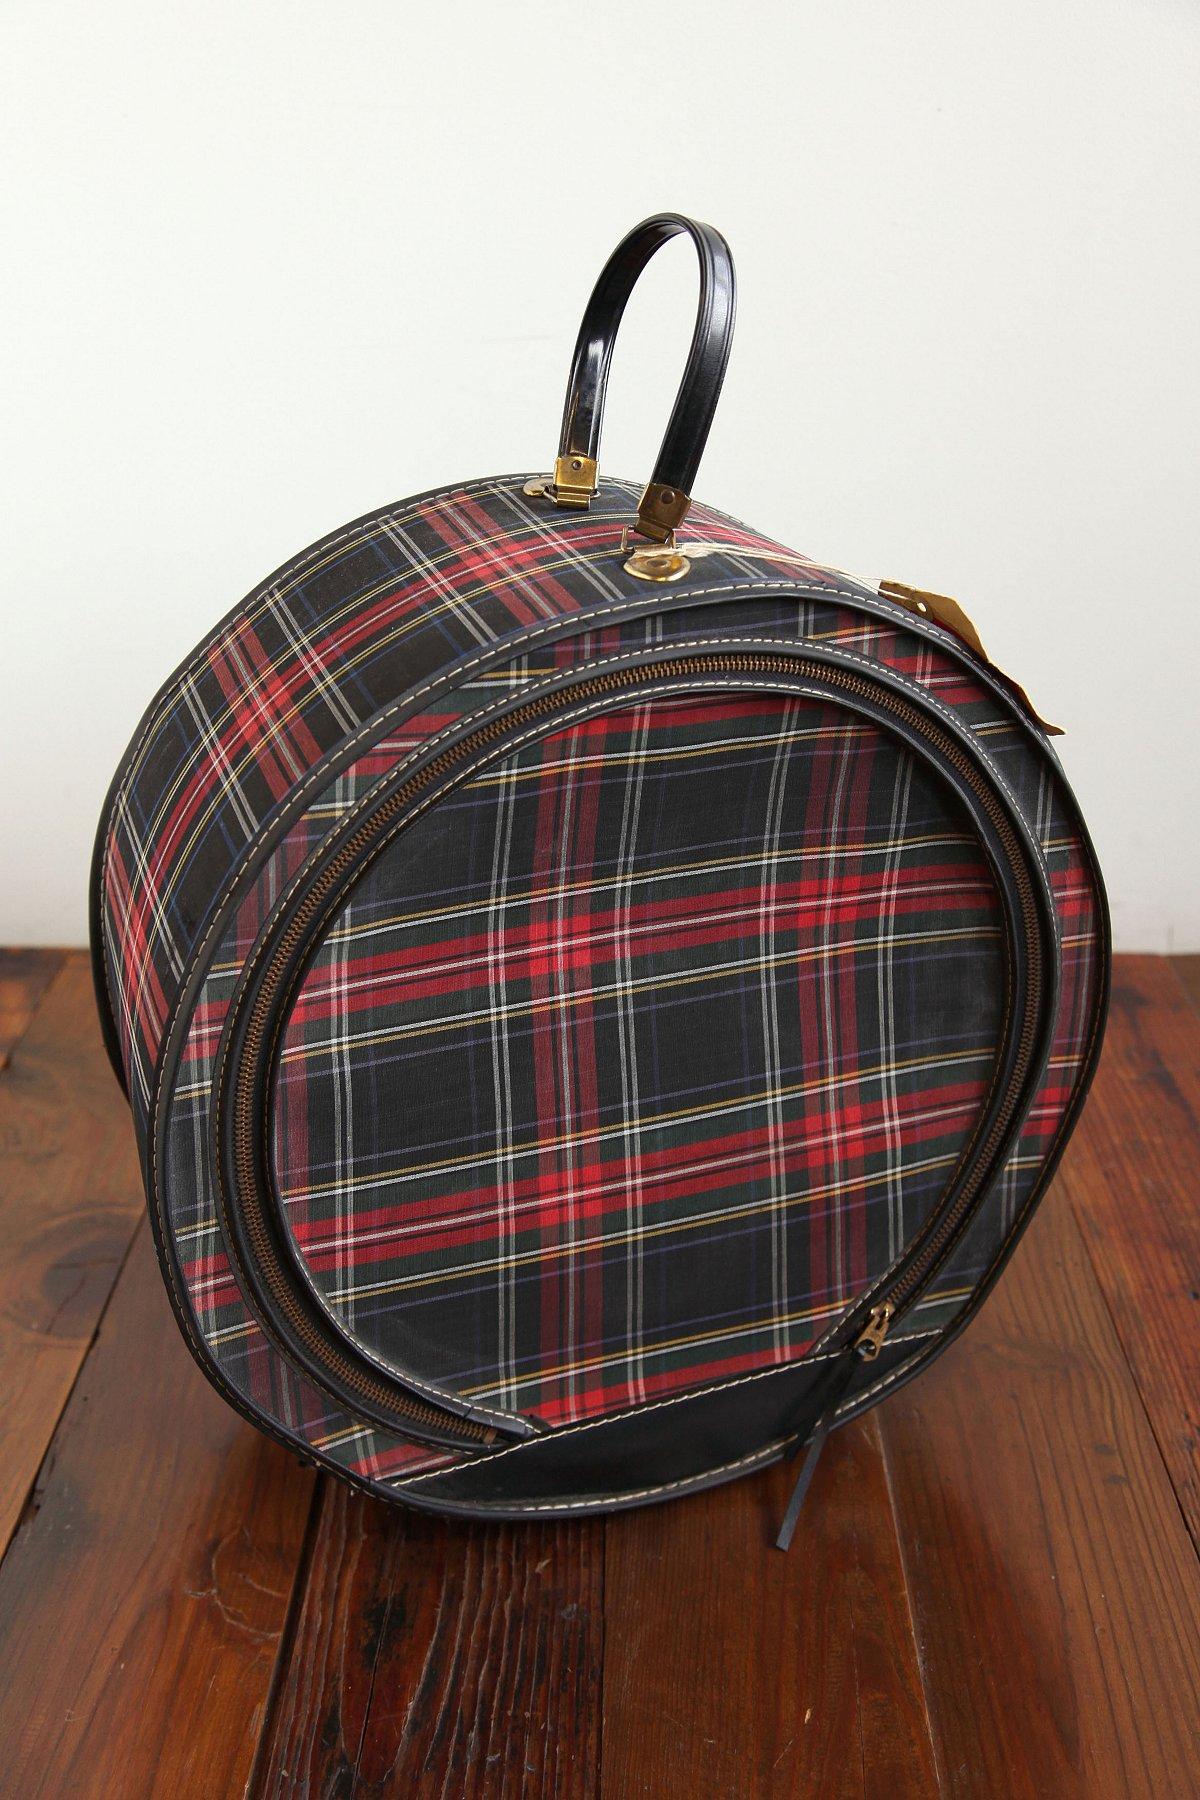 Vintage Round Plaid Suitcase